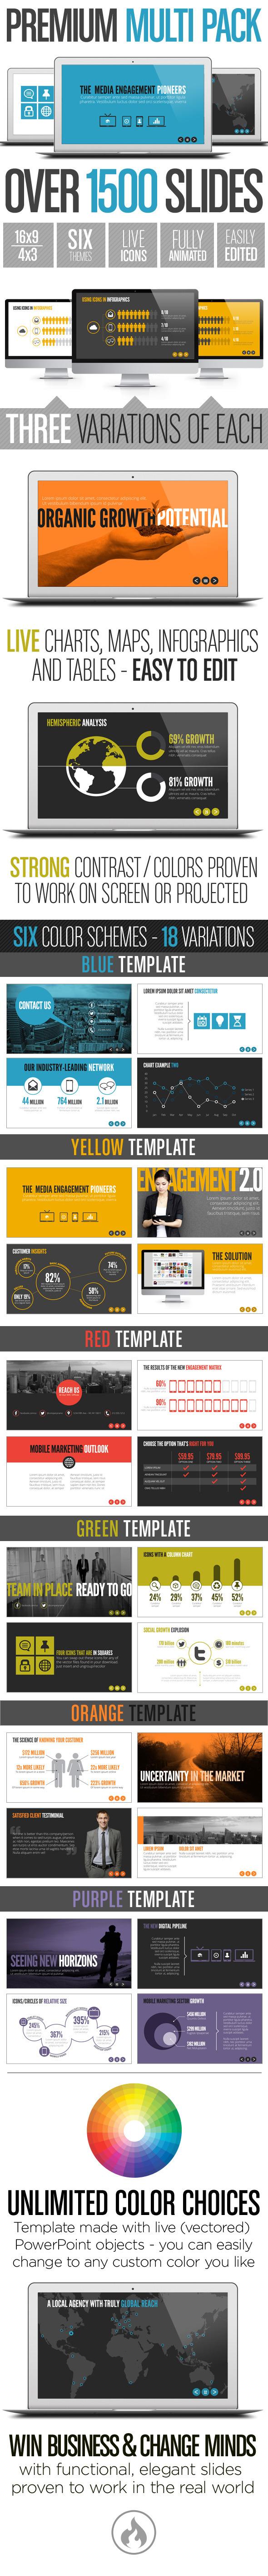 premium multi pack template system graphicriver